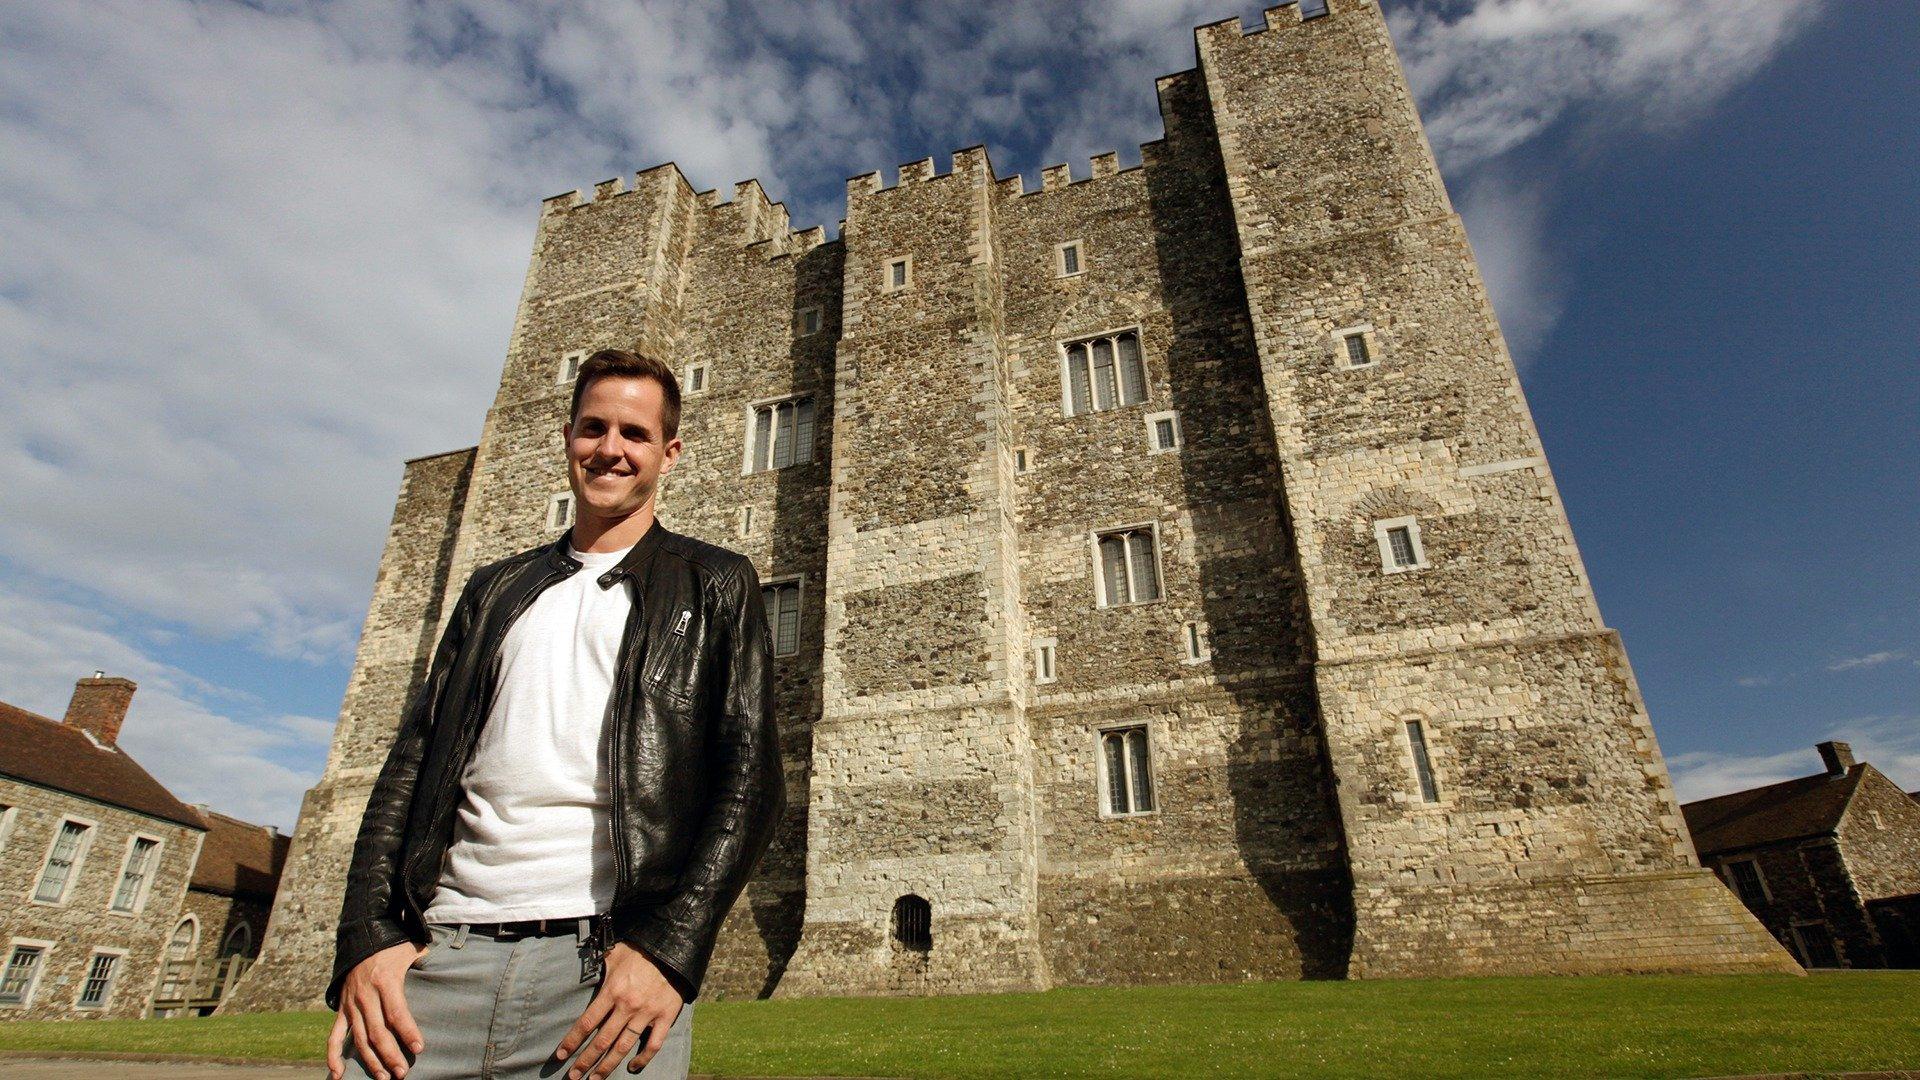 Show Secrets of Great British Castles